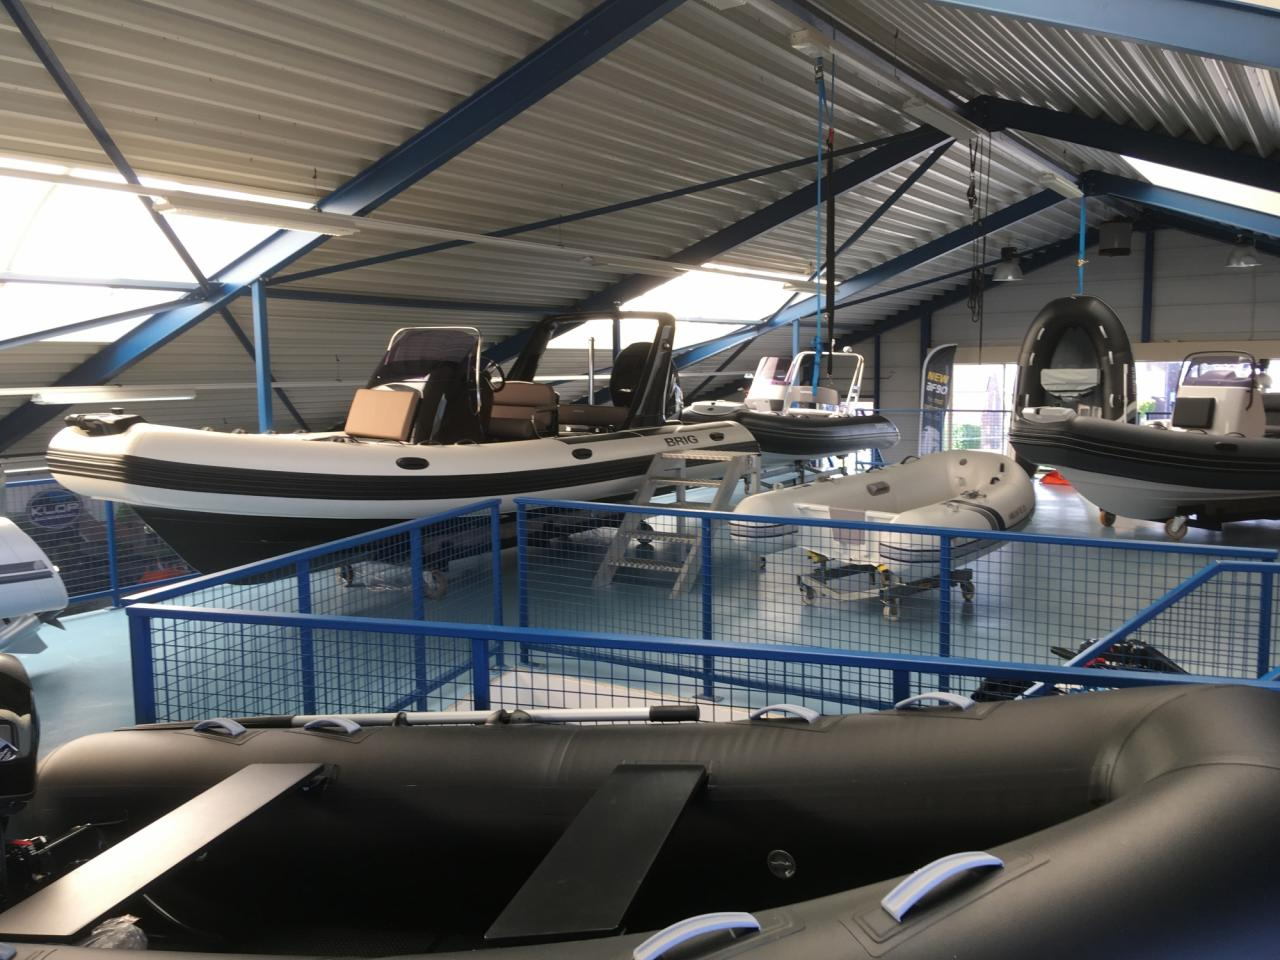 Ruim aanbod Brig en Grand rubberboten! 1